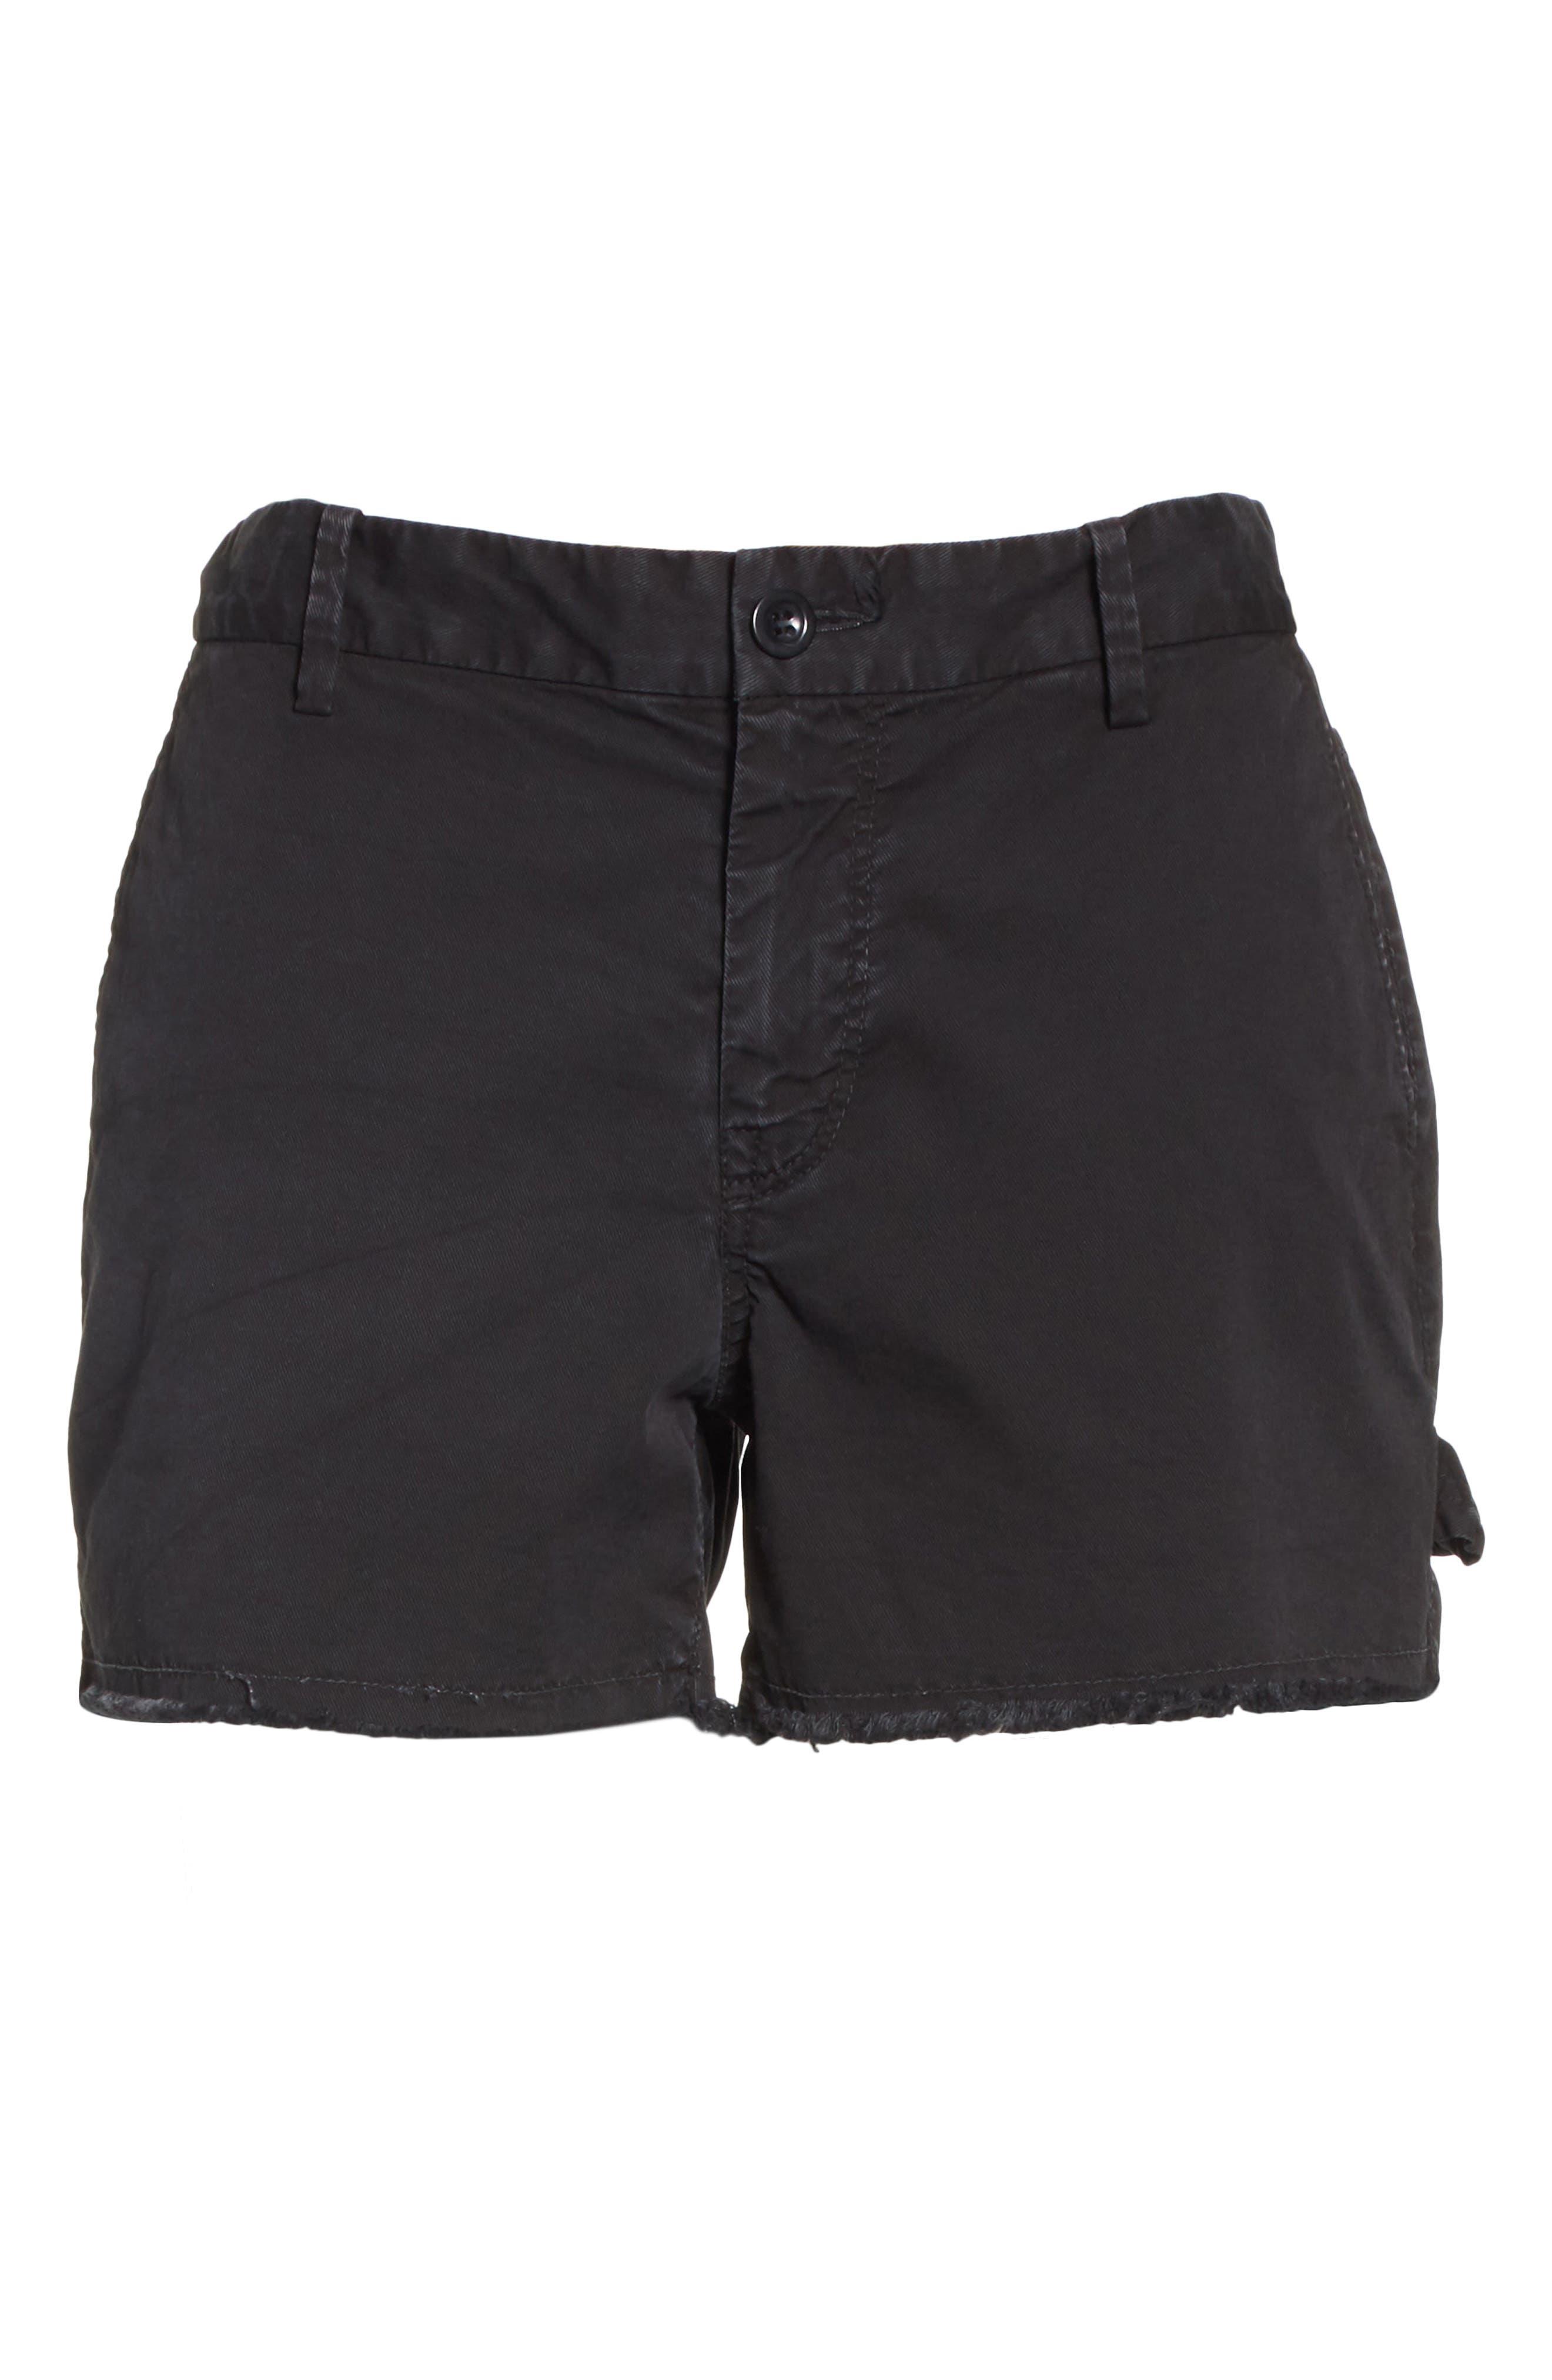 Carpenter Shorts,                             Alternate thumbnail 6, color,                             Carbon